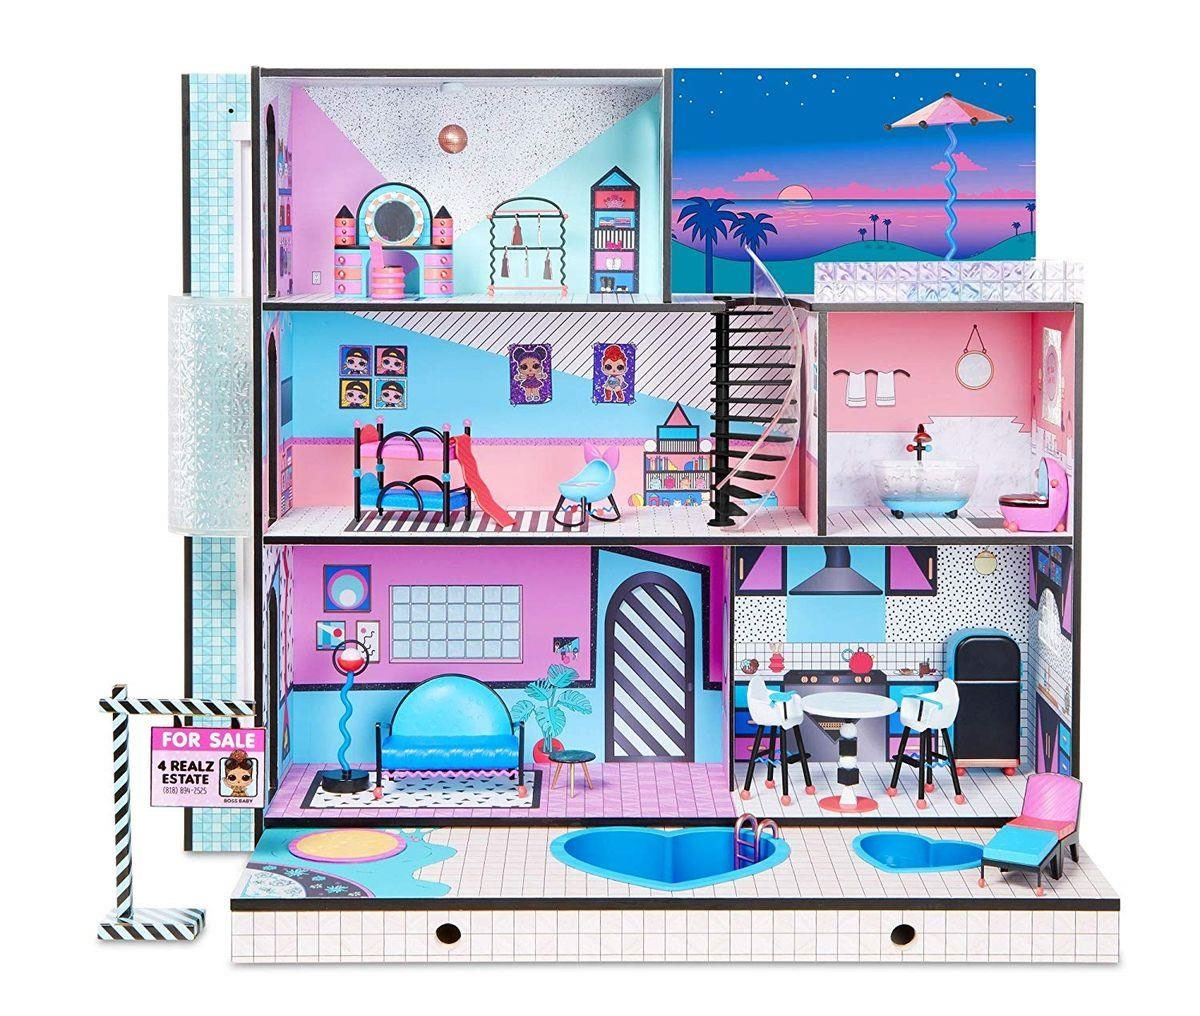 L.O.L. Surprise Haus LOL Haus